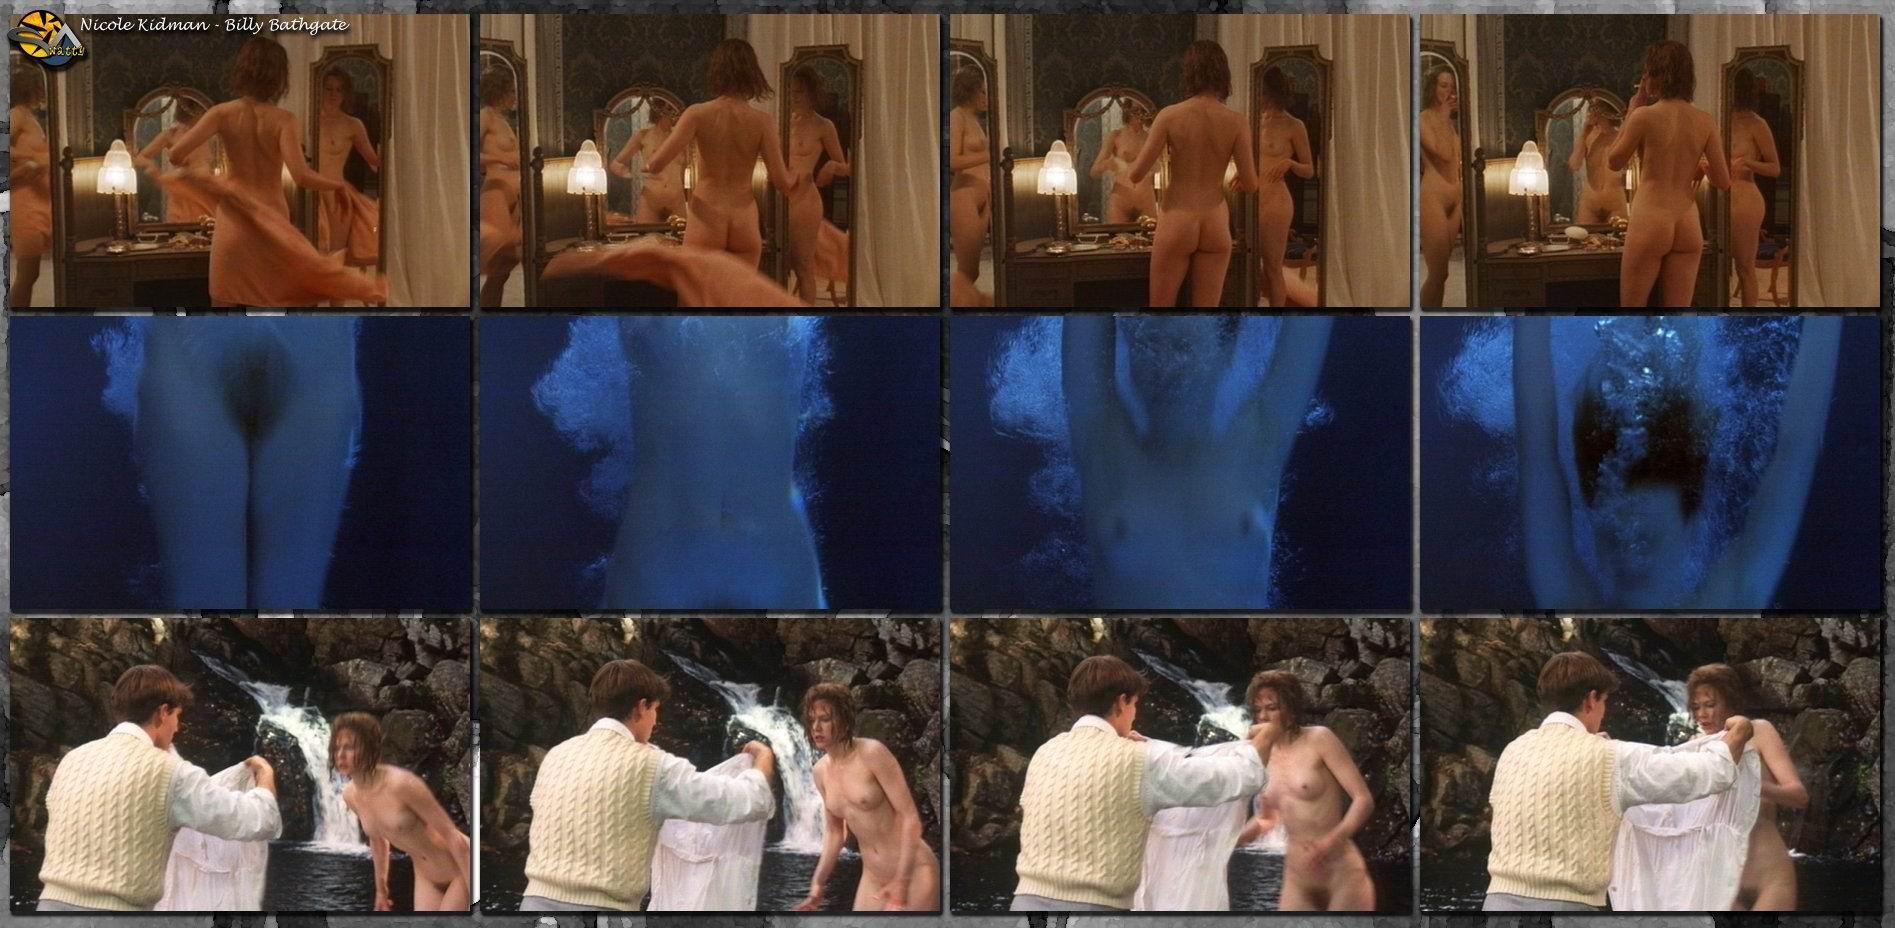 Ulsorg Nicole Kidman Nude In Billy Bathgate